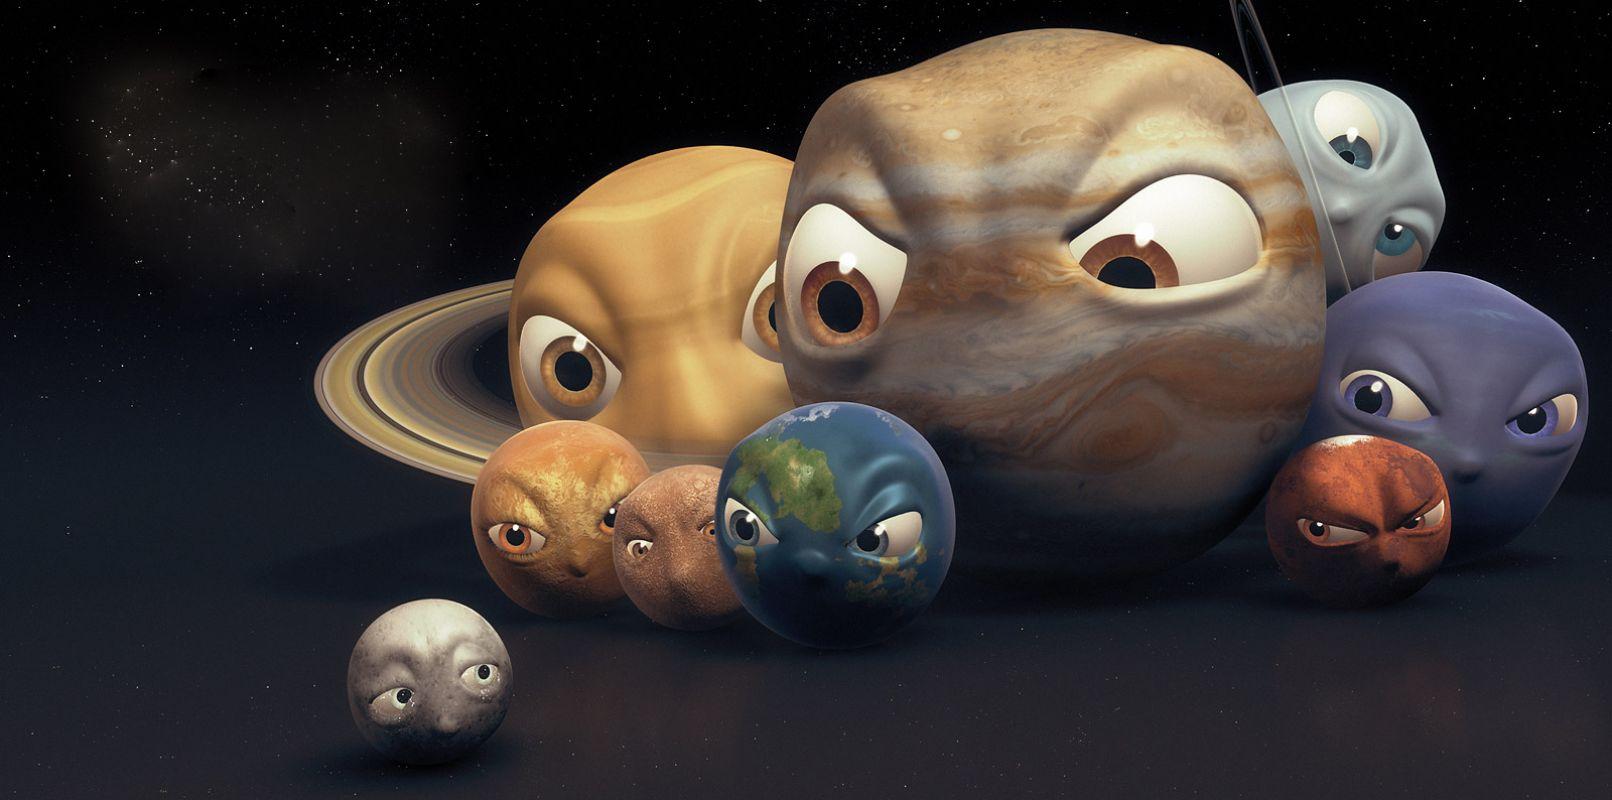 чому плутон вигнали з родини великих планет